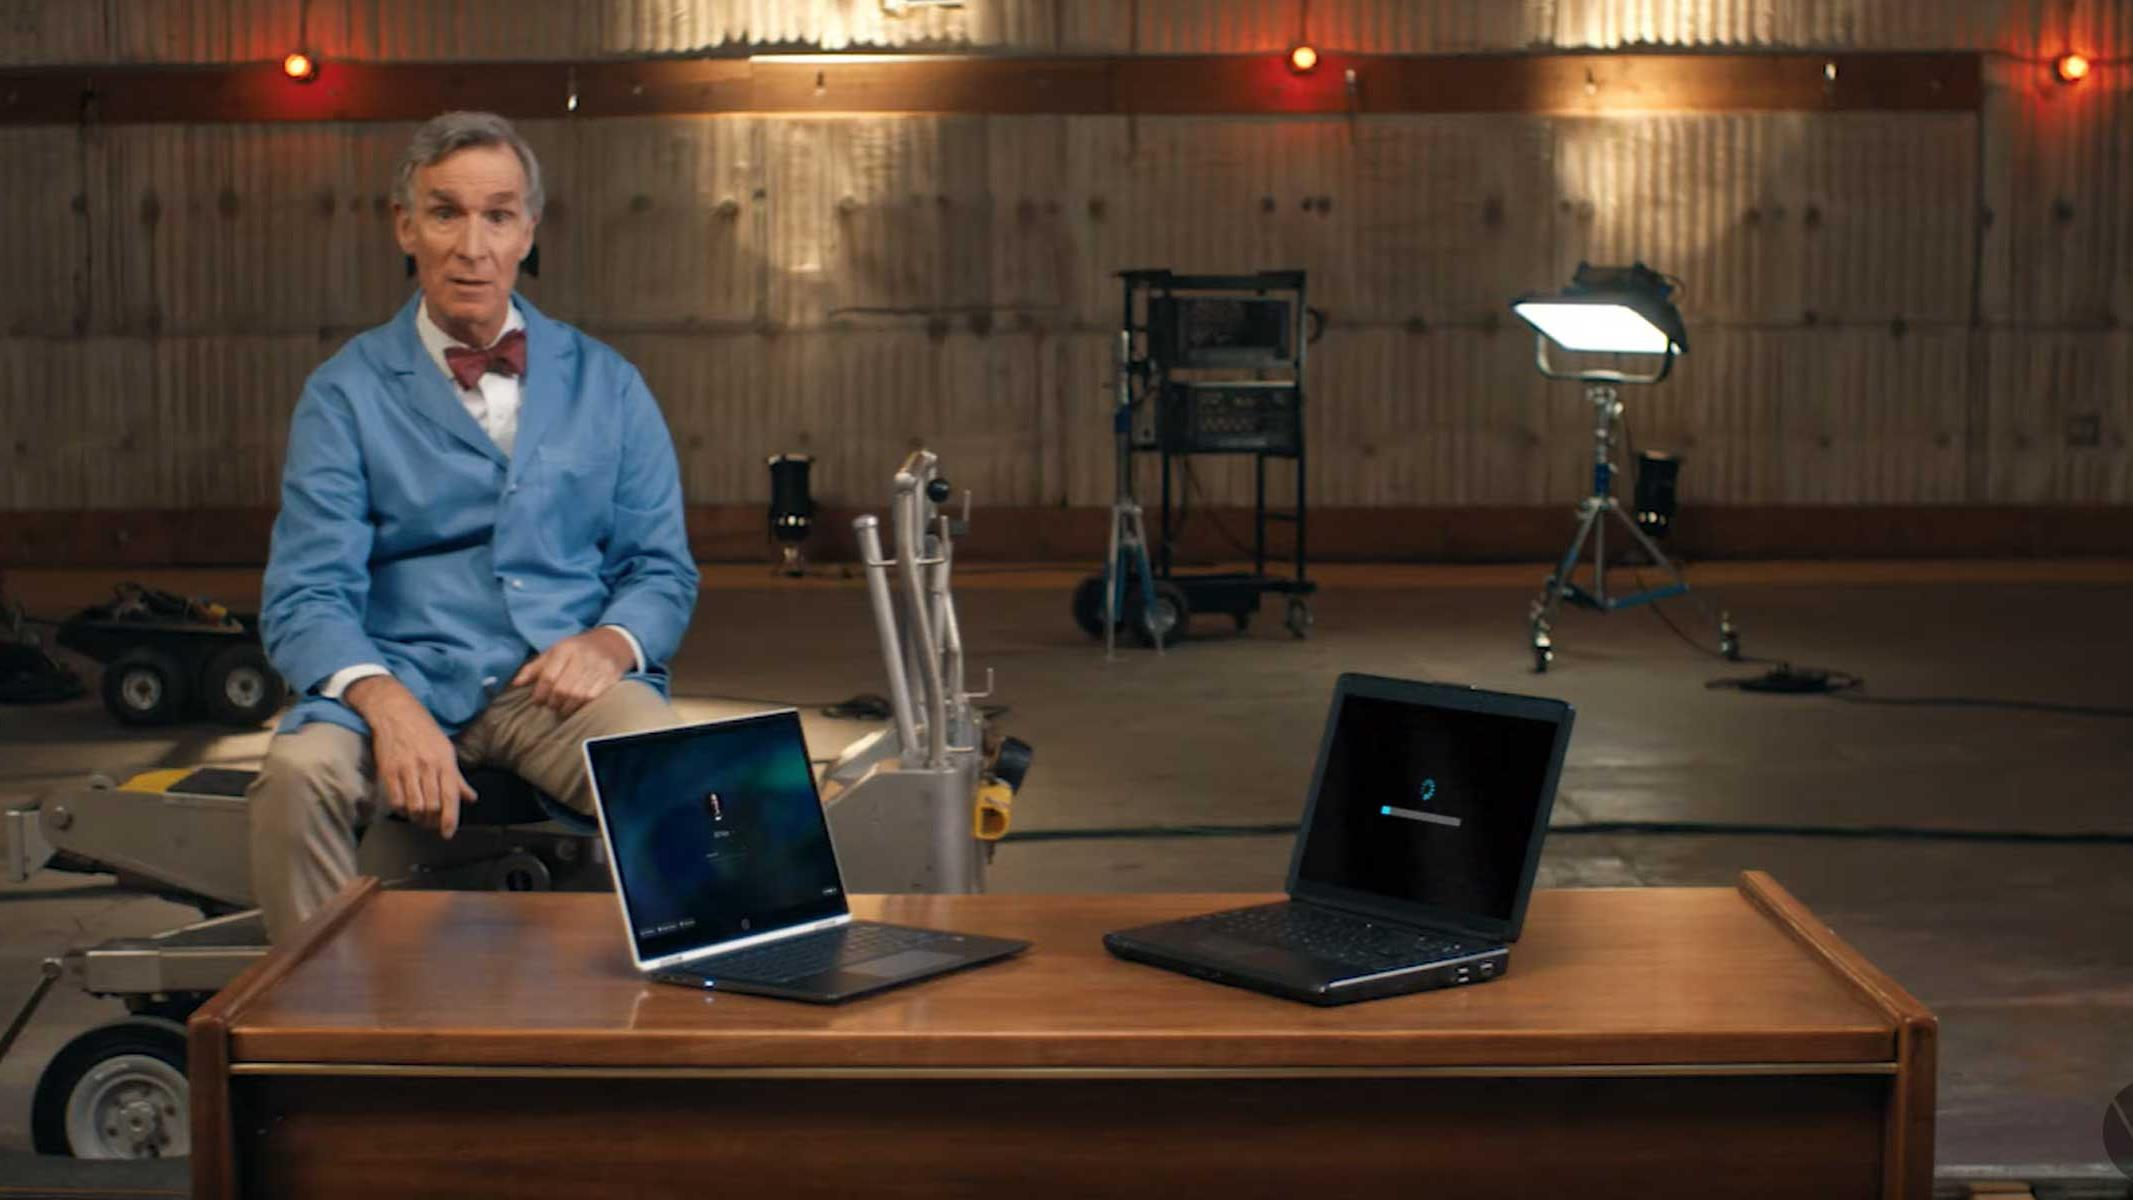 Bill Nye The Science Guy Headlines New Google Chromebook Ads